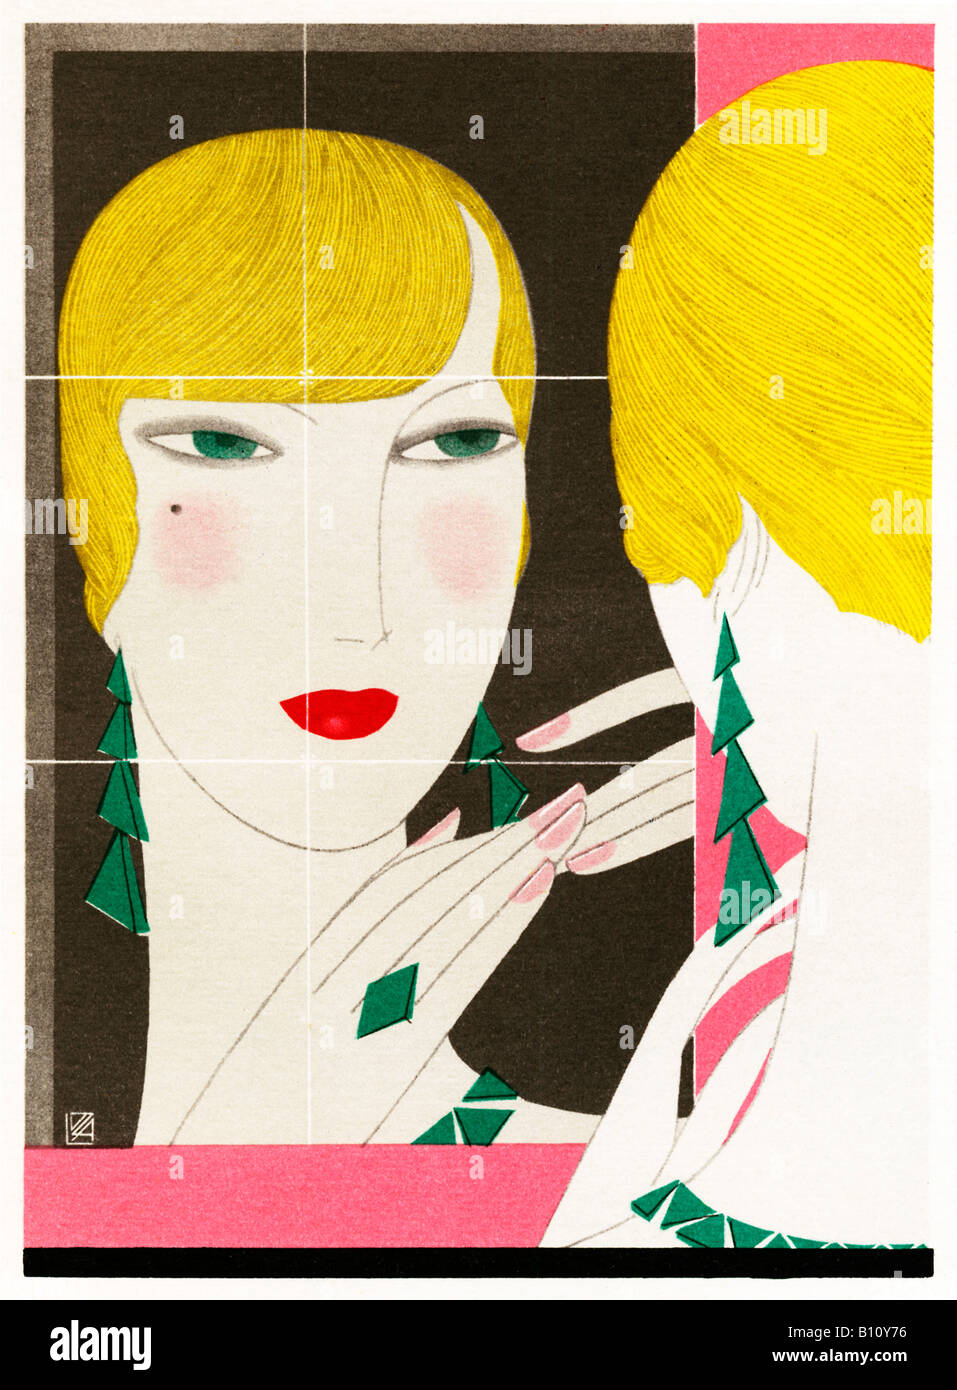 Art Deco Stockfotos & Art Deco Bilder - Alamy